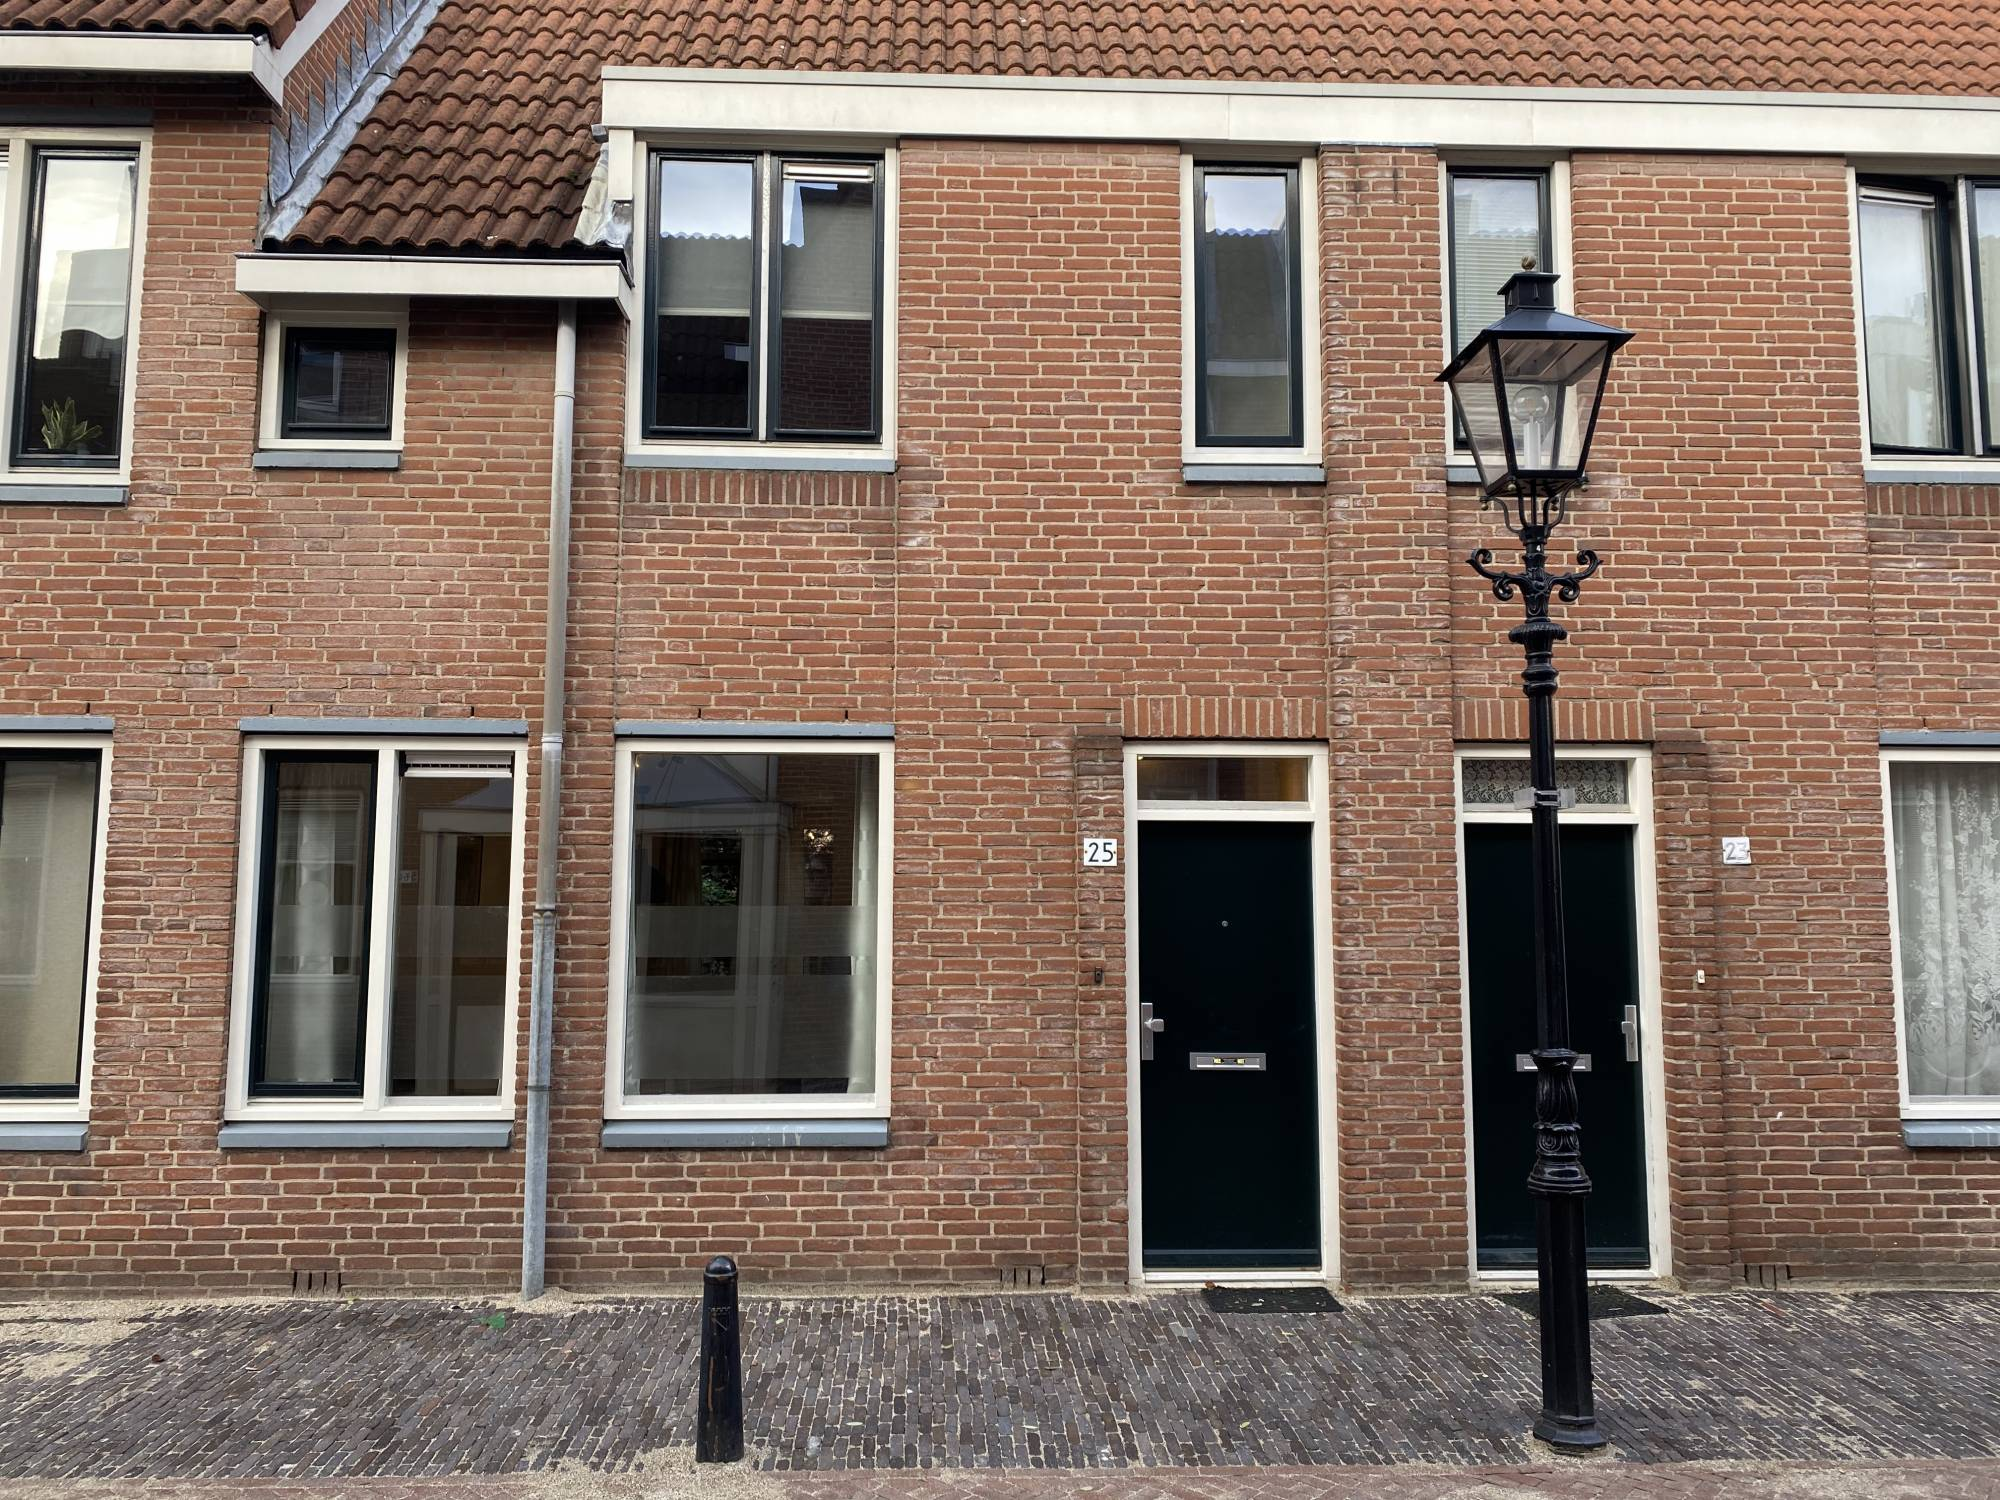 Oranjestraat 25